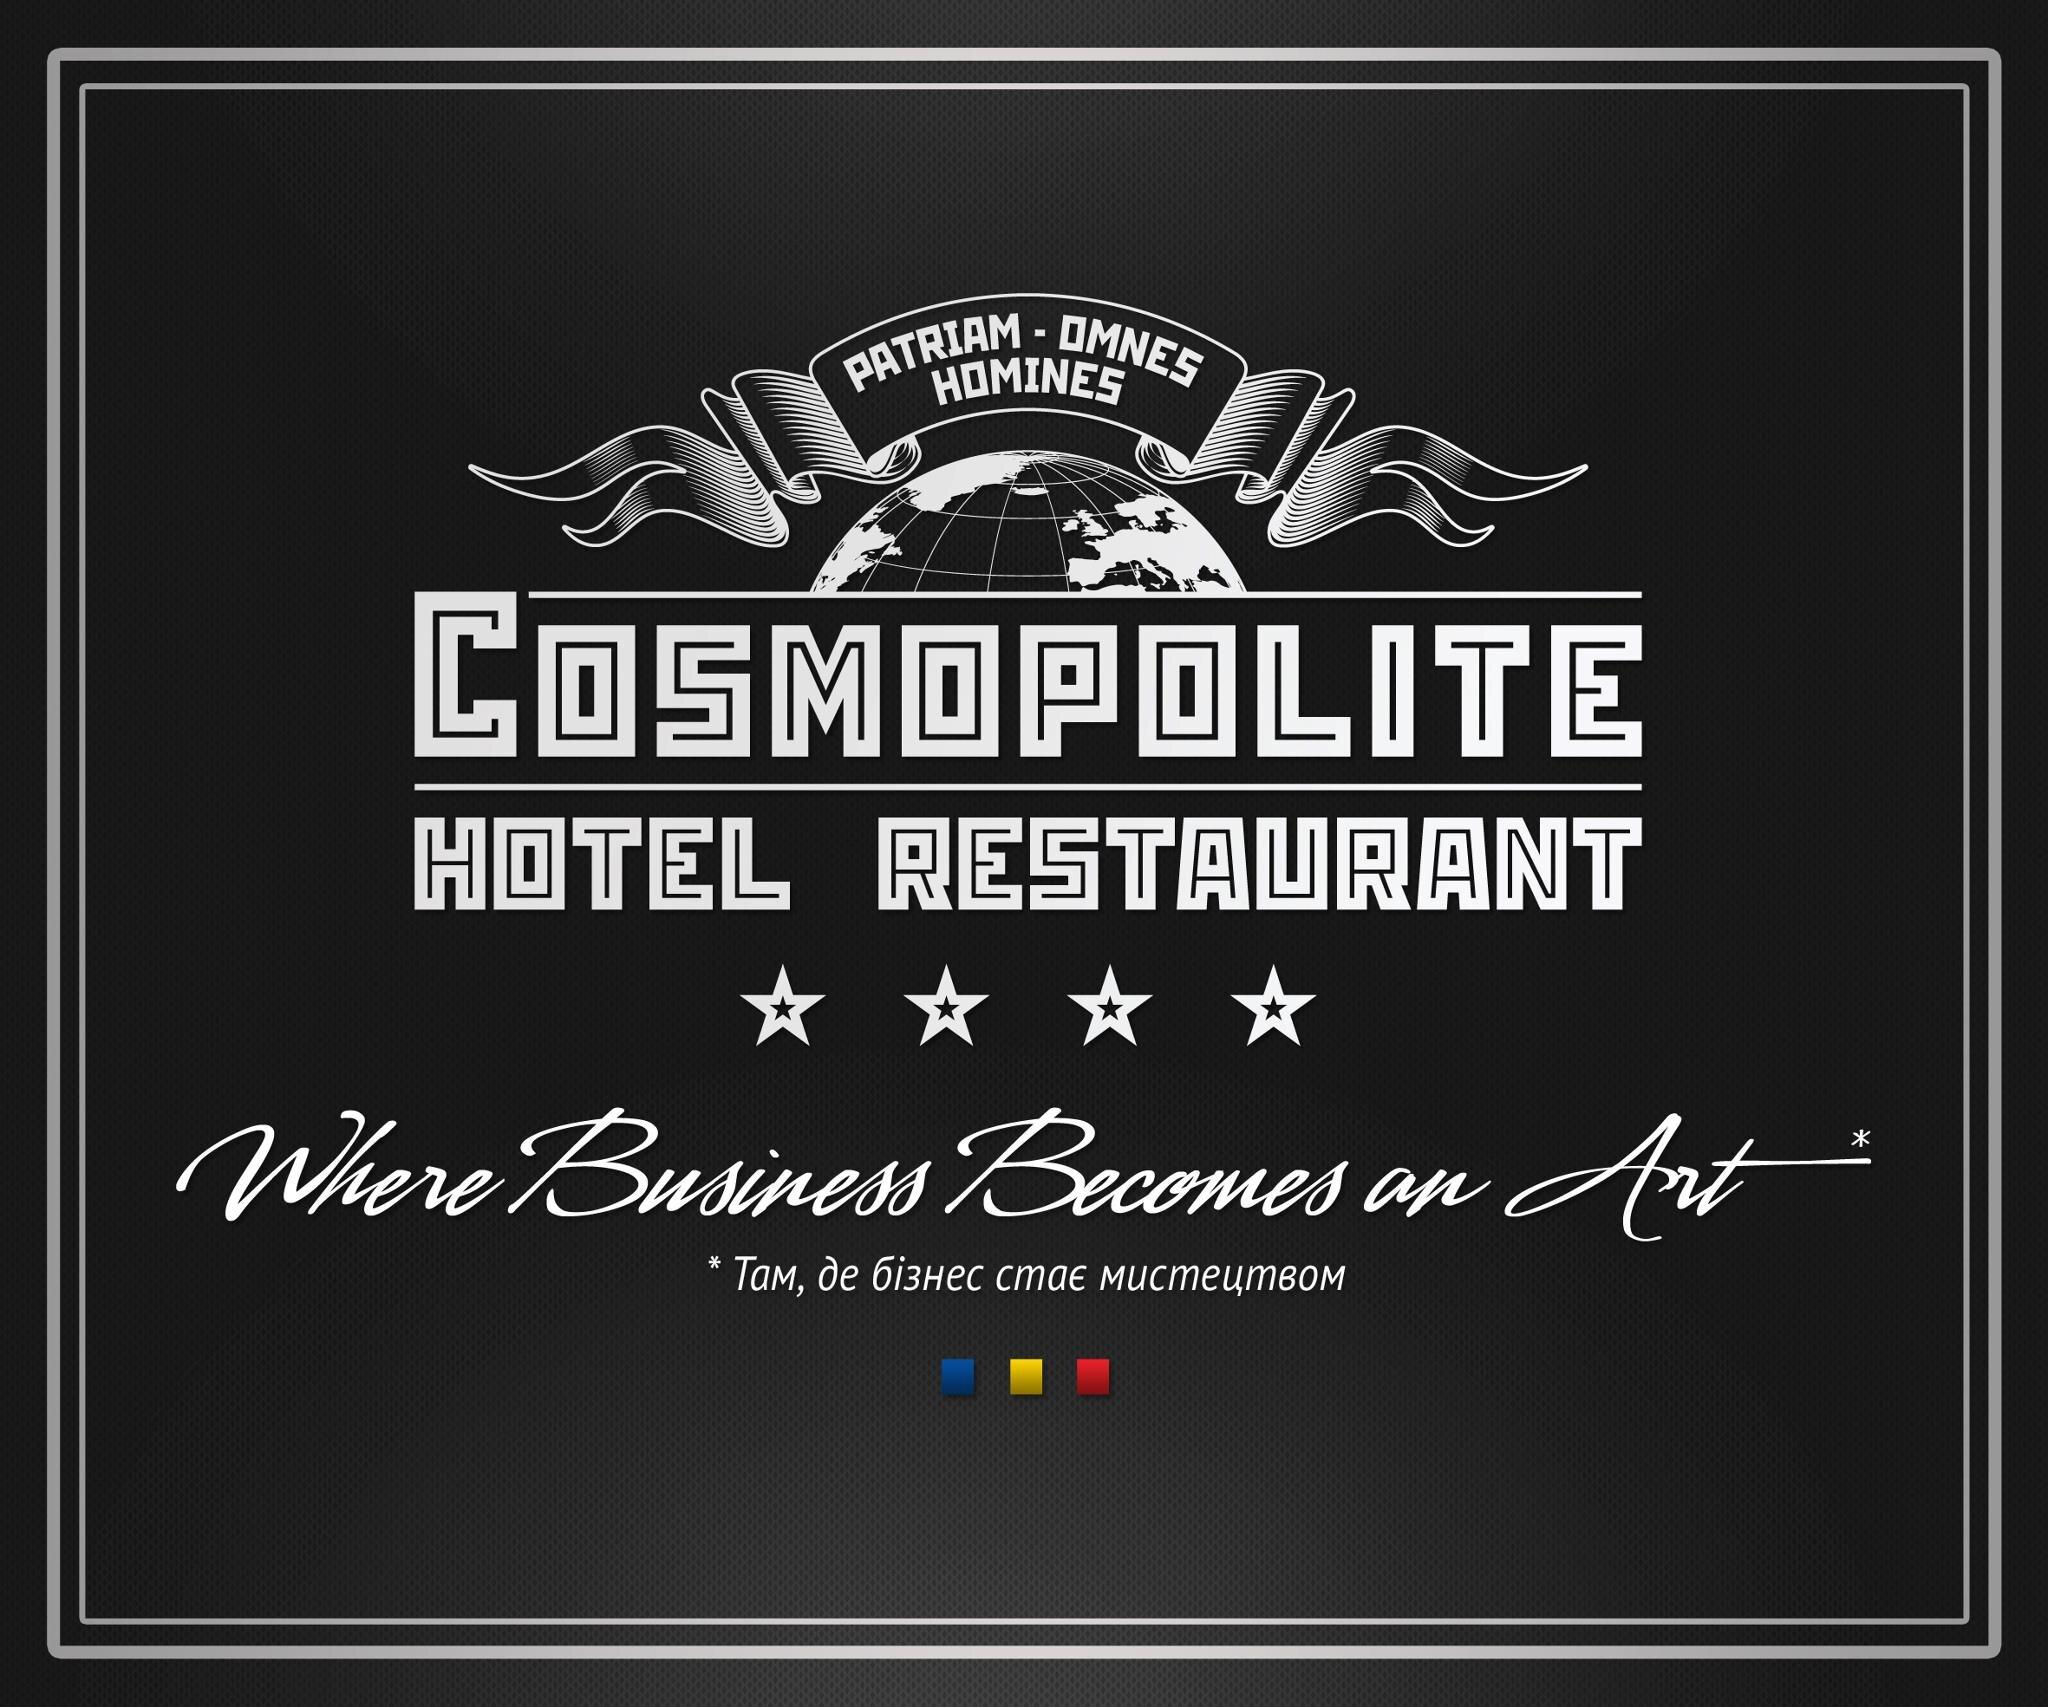 @Cosmo_Hotel